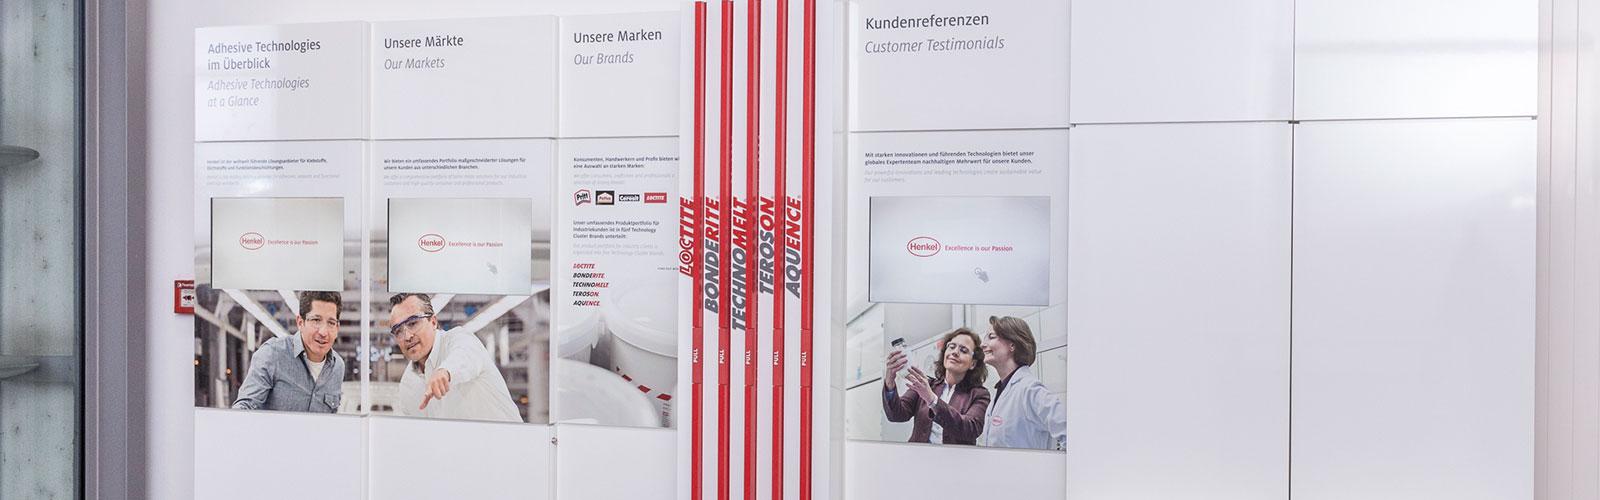 Braunwagner customer journey Henkel adhesives 2016